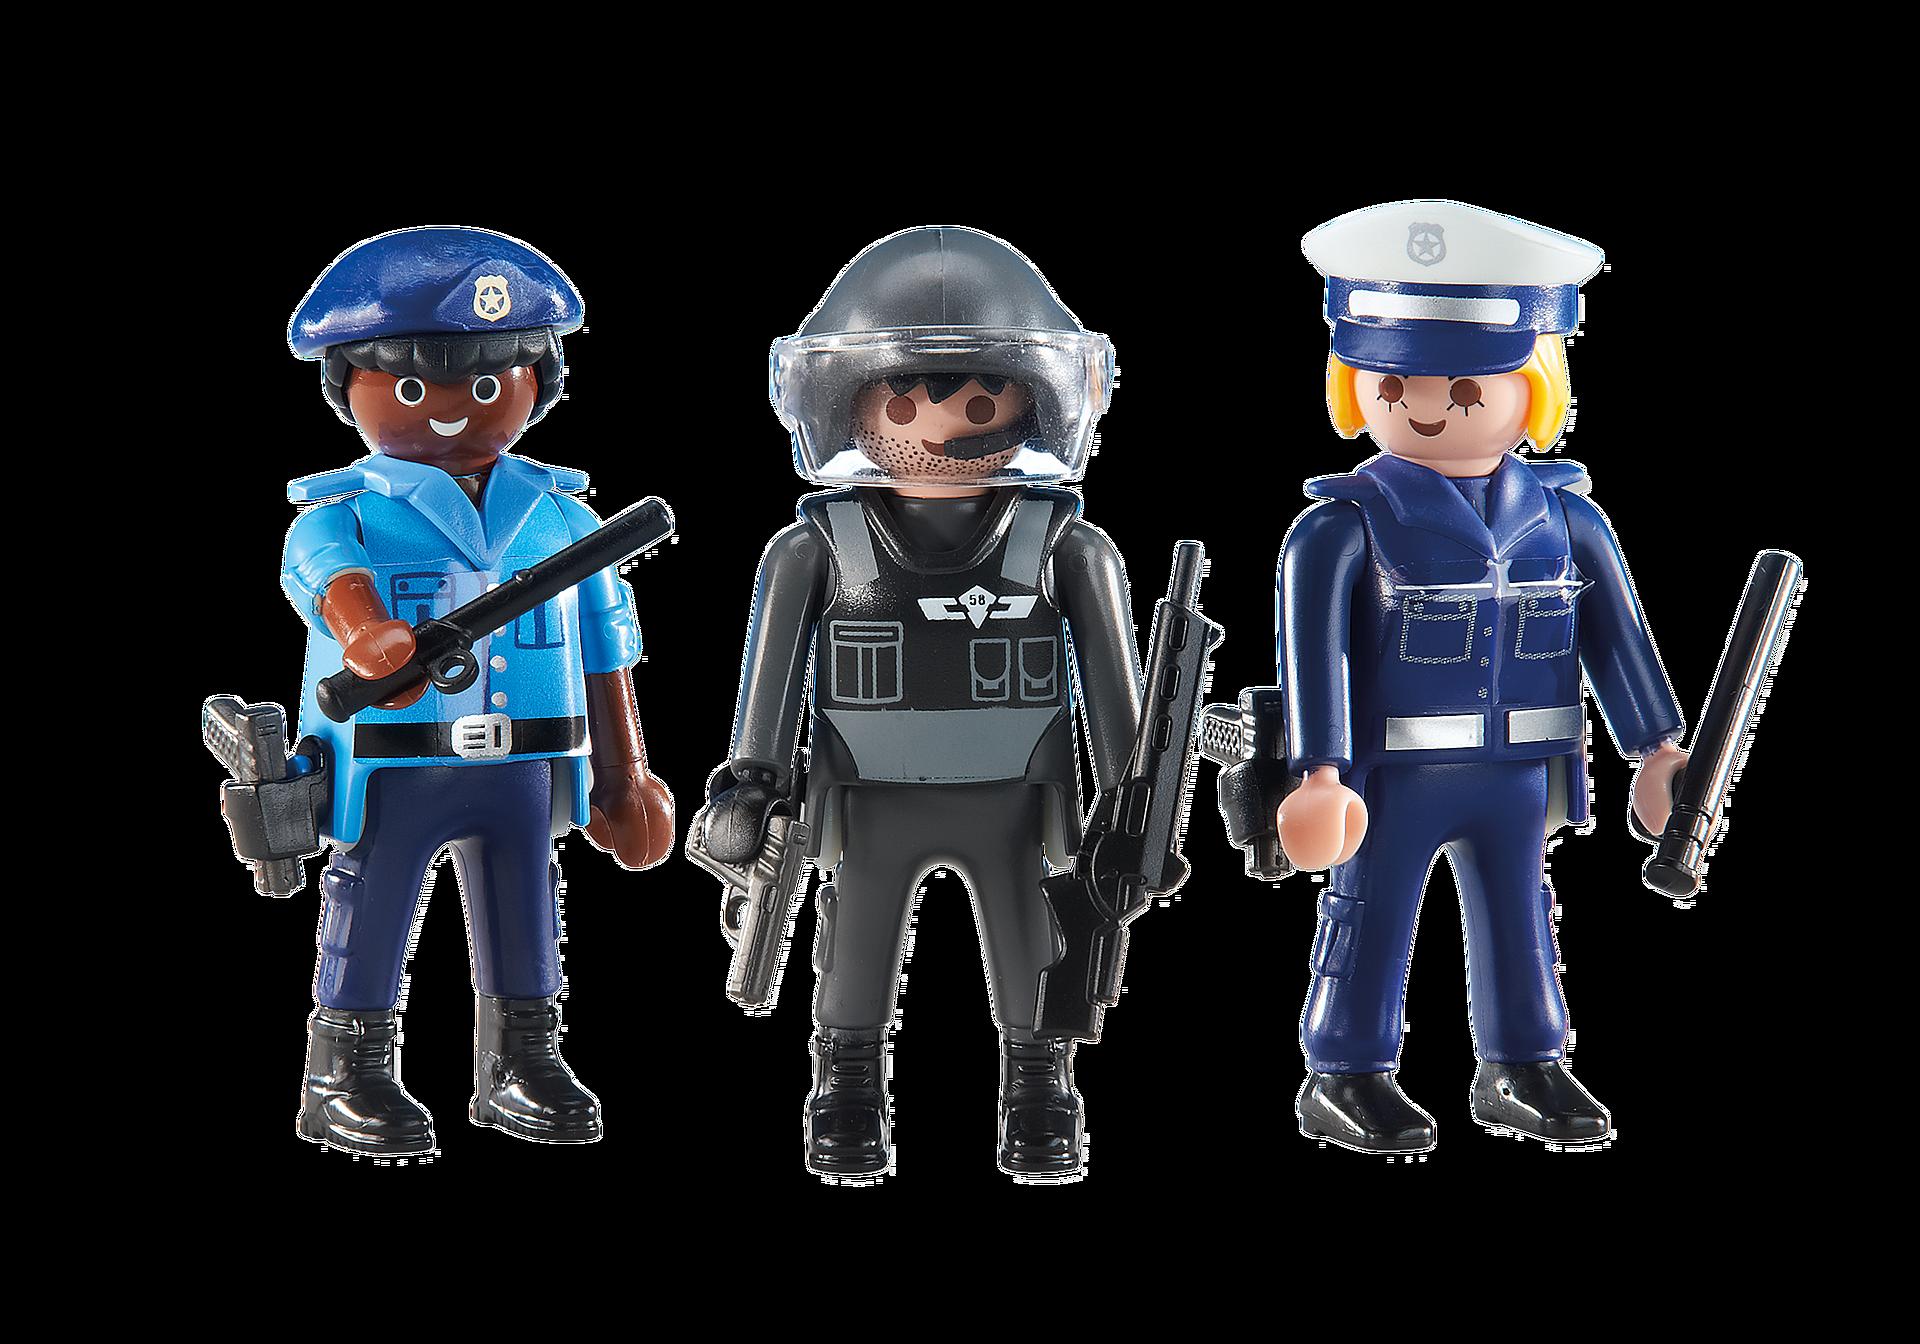 http://media.playmobil.com/i/playmobil/6501_product_detail/3 politieagenten